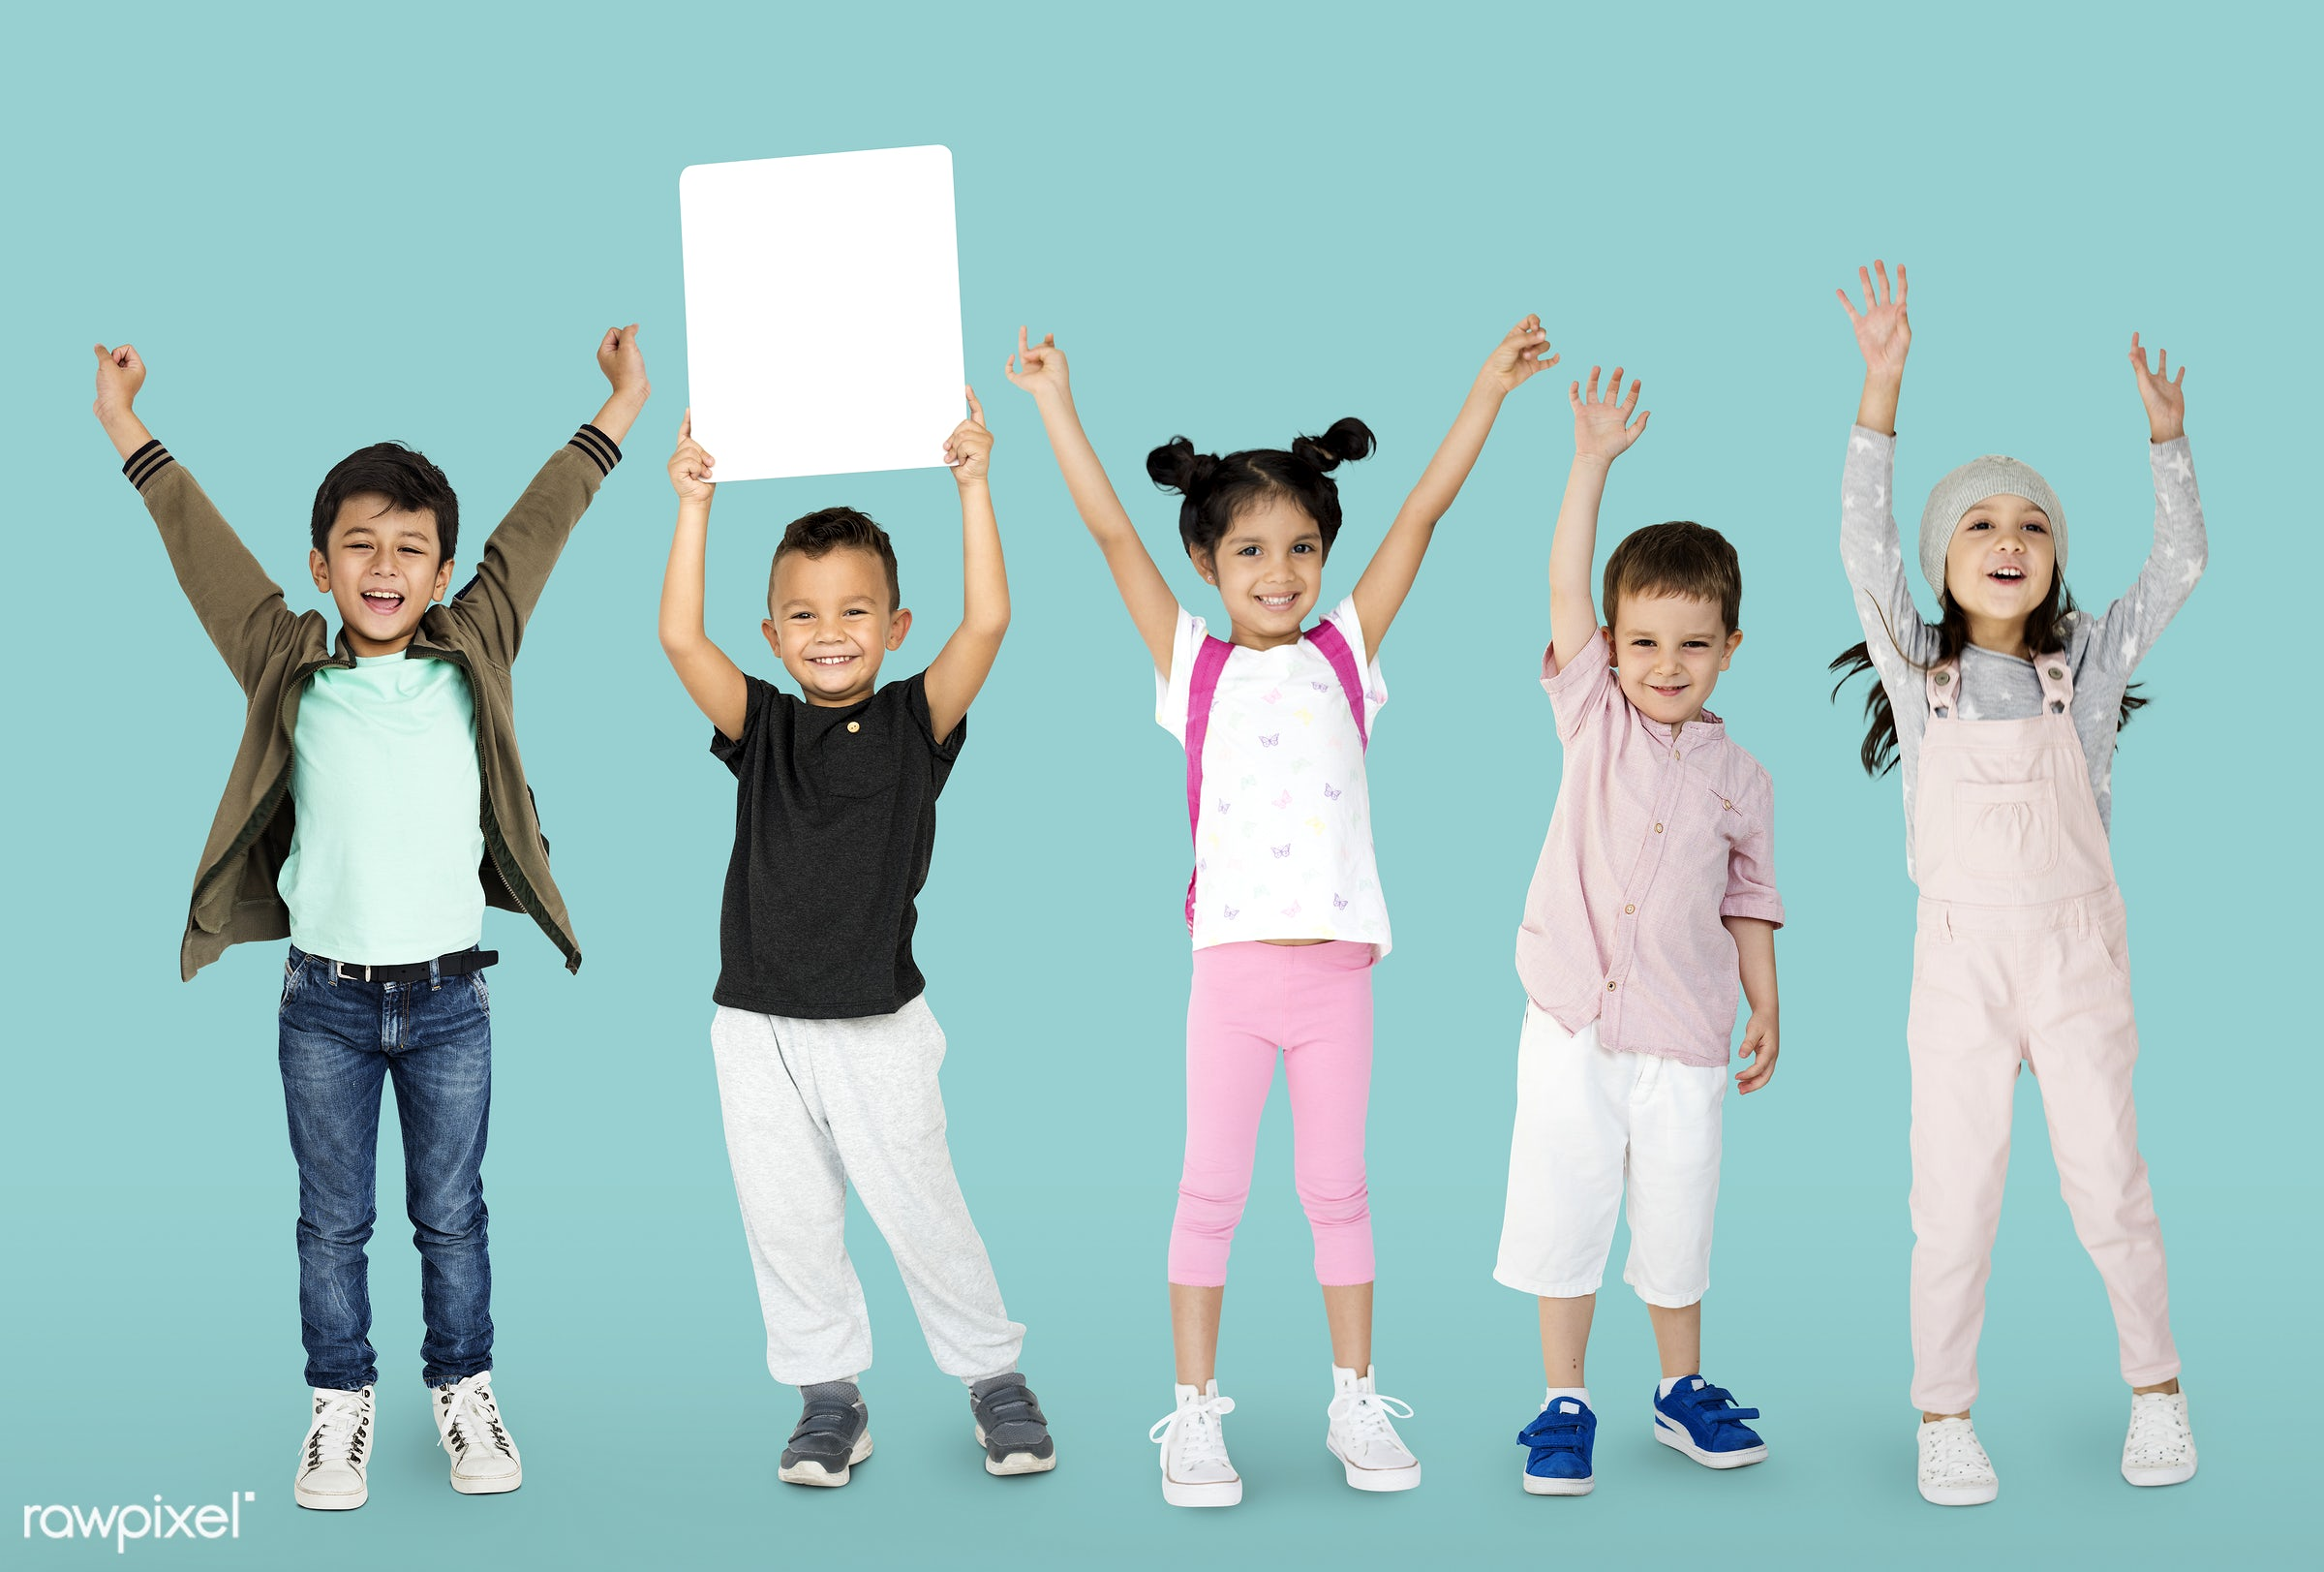 studio, copy space, person, playful, paper, children, little, entertain, show, people, kid, caucasian, child, girl, boys,...